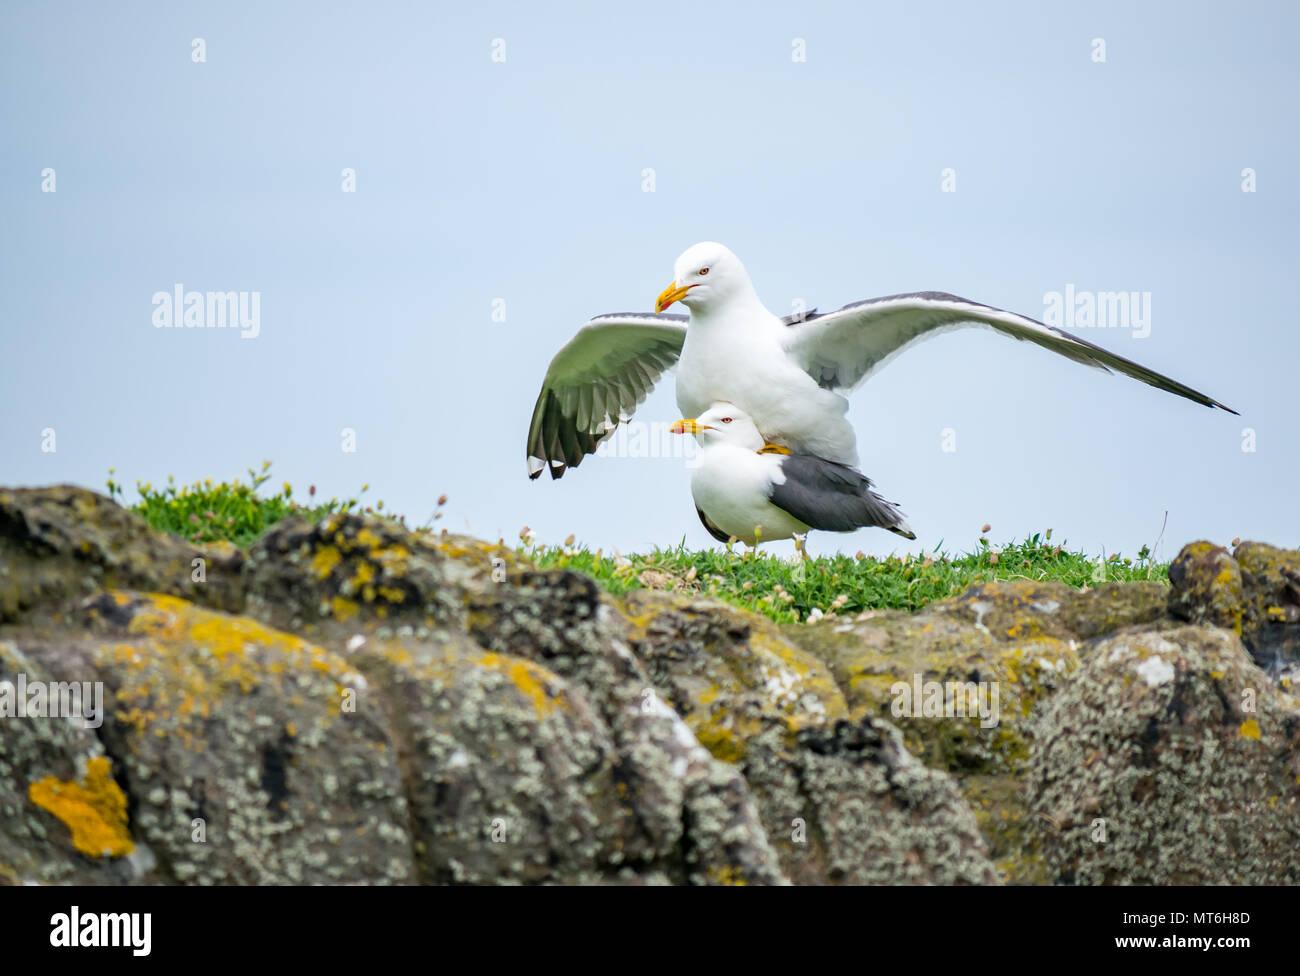 European herring gulls mating, Larus argentatus, Isle of May nature reserve, Scotland, UK - Stock Image